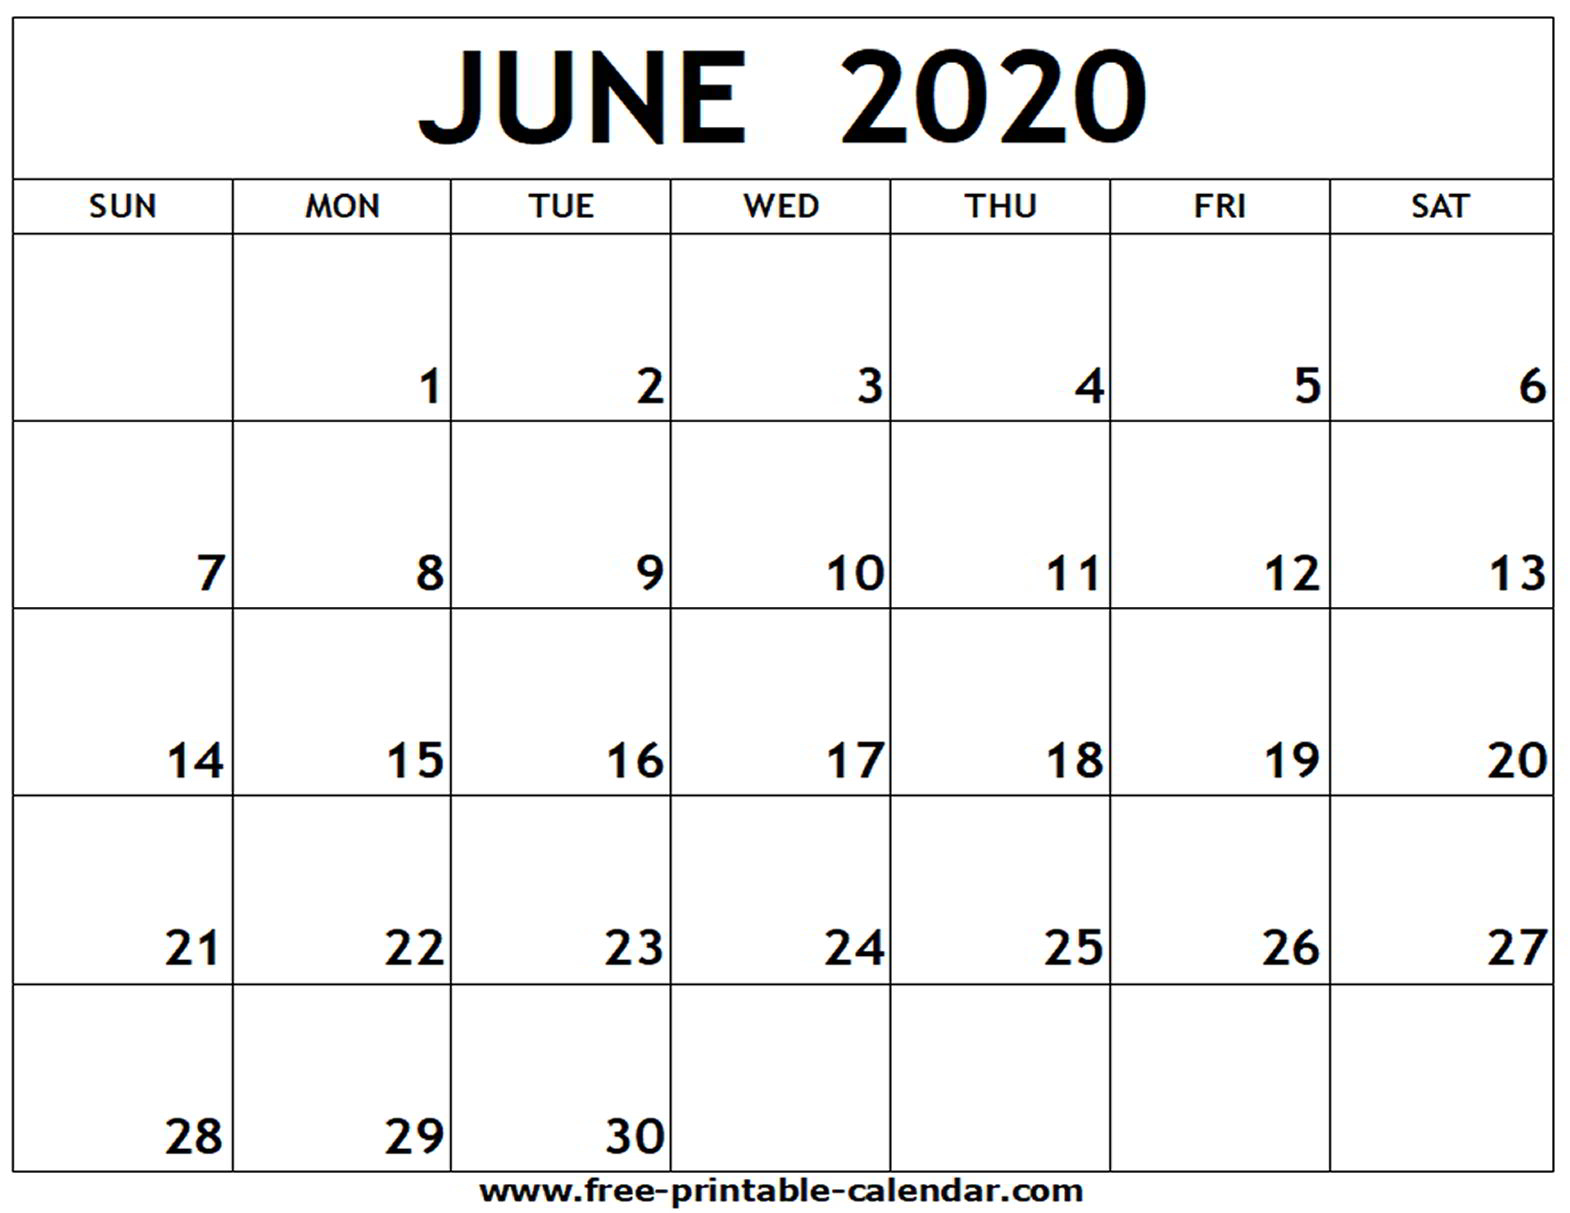 Blank Monthly Calendar July 2020 - Wpa.wpart.co